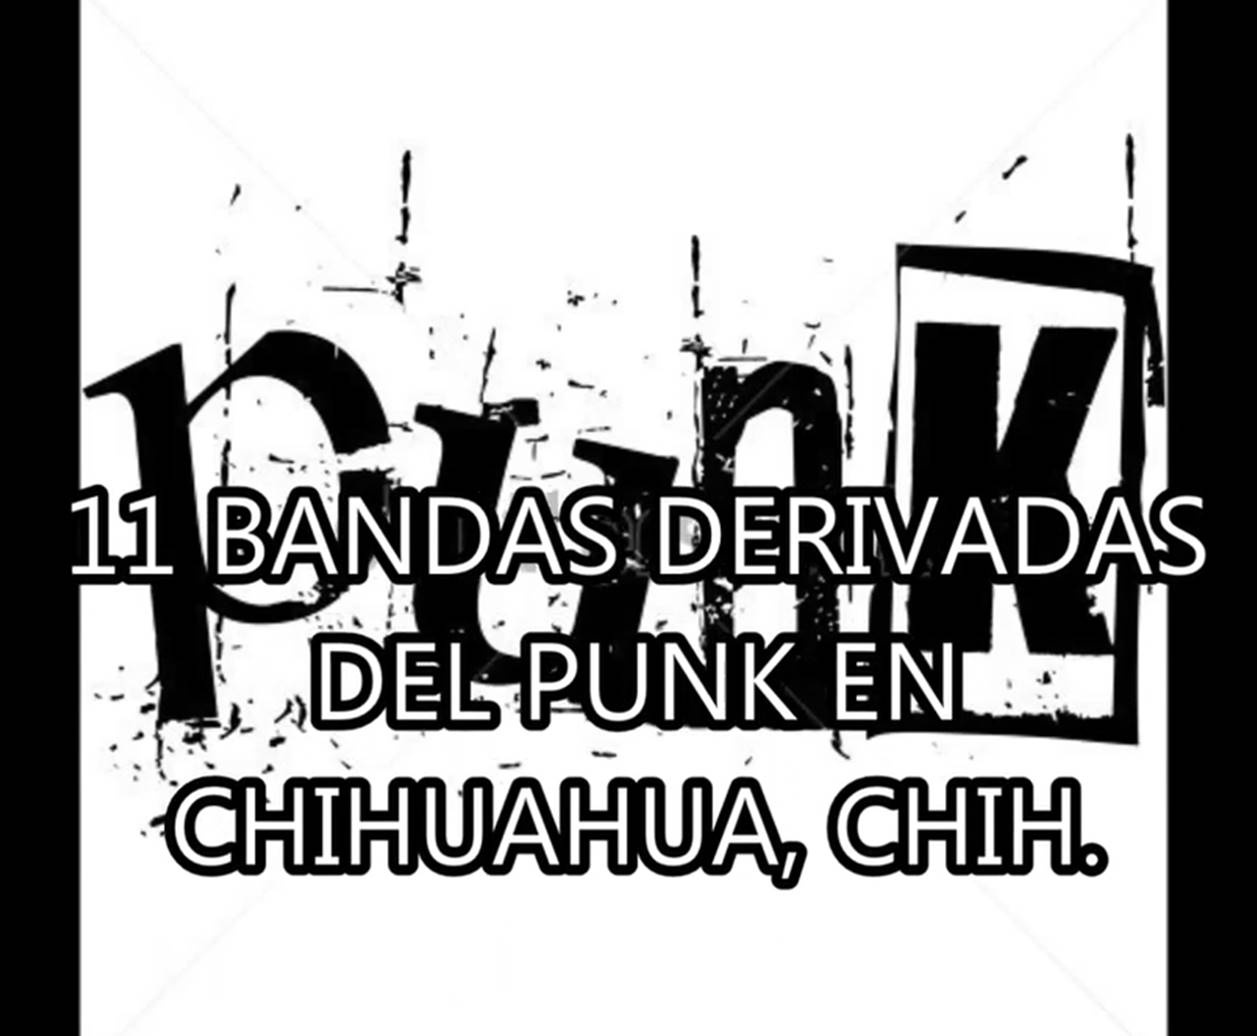 11 bandas derivadas del punk en Chihuahua, Chih.